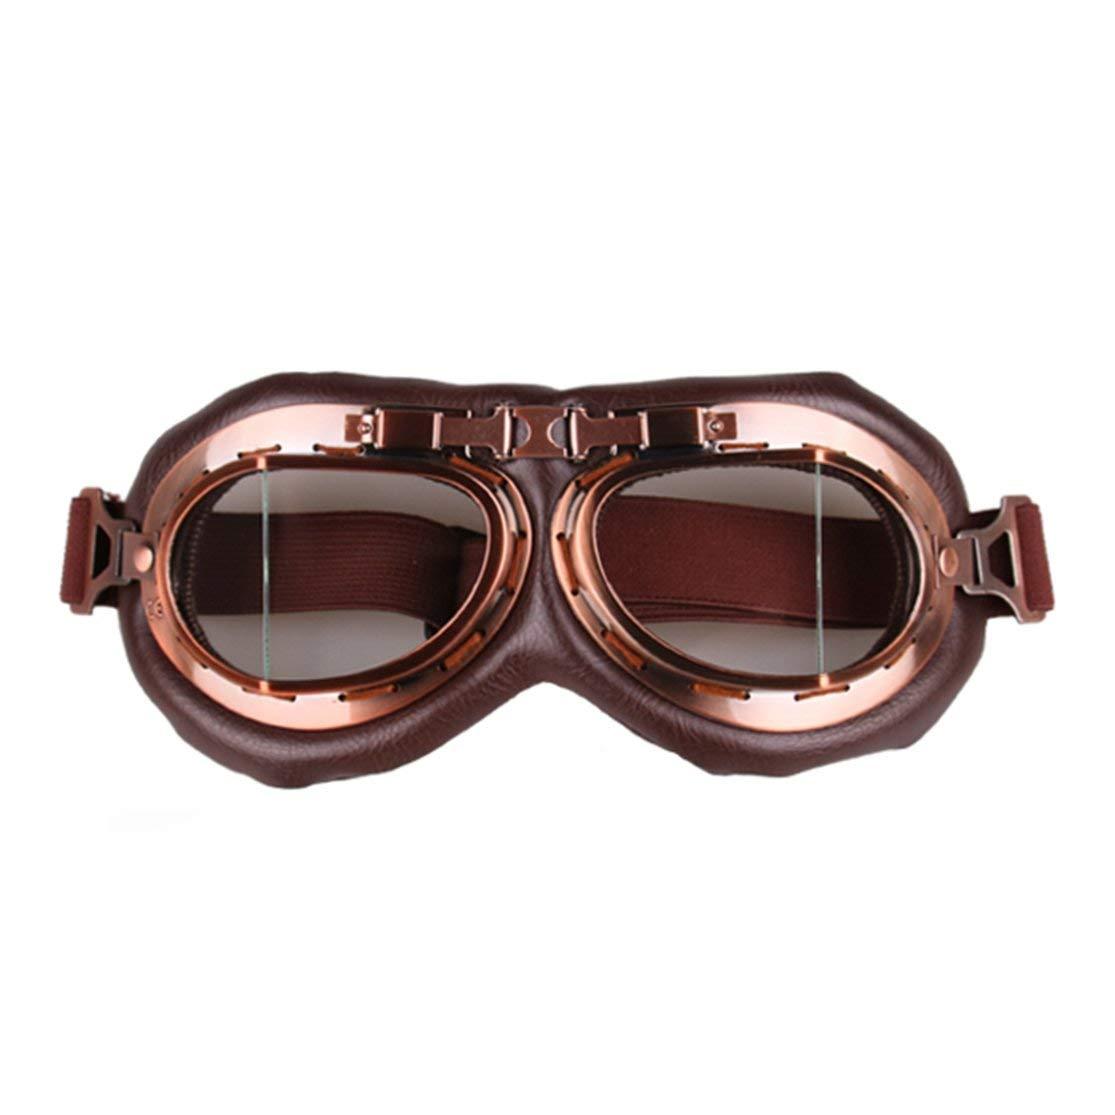 Color:Transparent Vintage Motorrad-Schutzbrille Motocross-Flieger-Pilotkreuzer Gl/äser Motorradsport Fahrrad-Mode Aufma/ß Brillen Brillen Kaemma